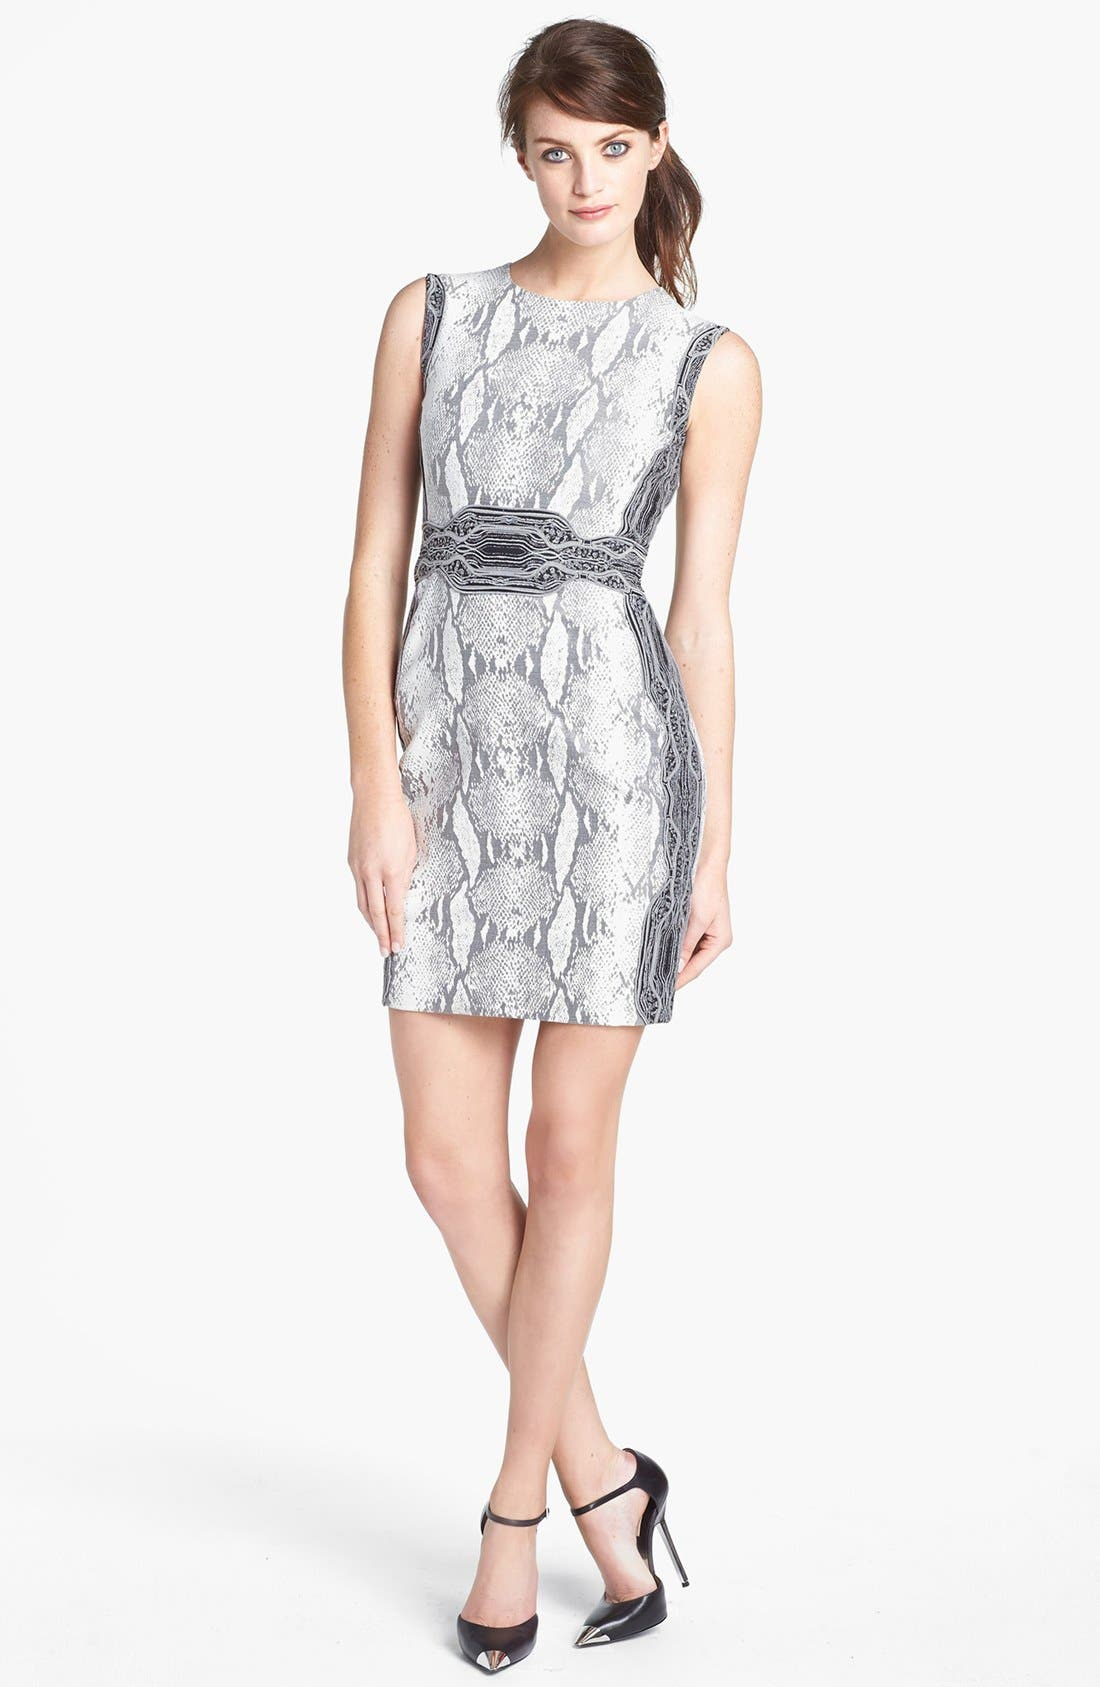 Main Image - Diane von Furstenberg 'Bey' Snake Print Sleeveless Dress